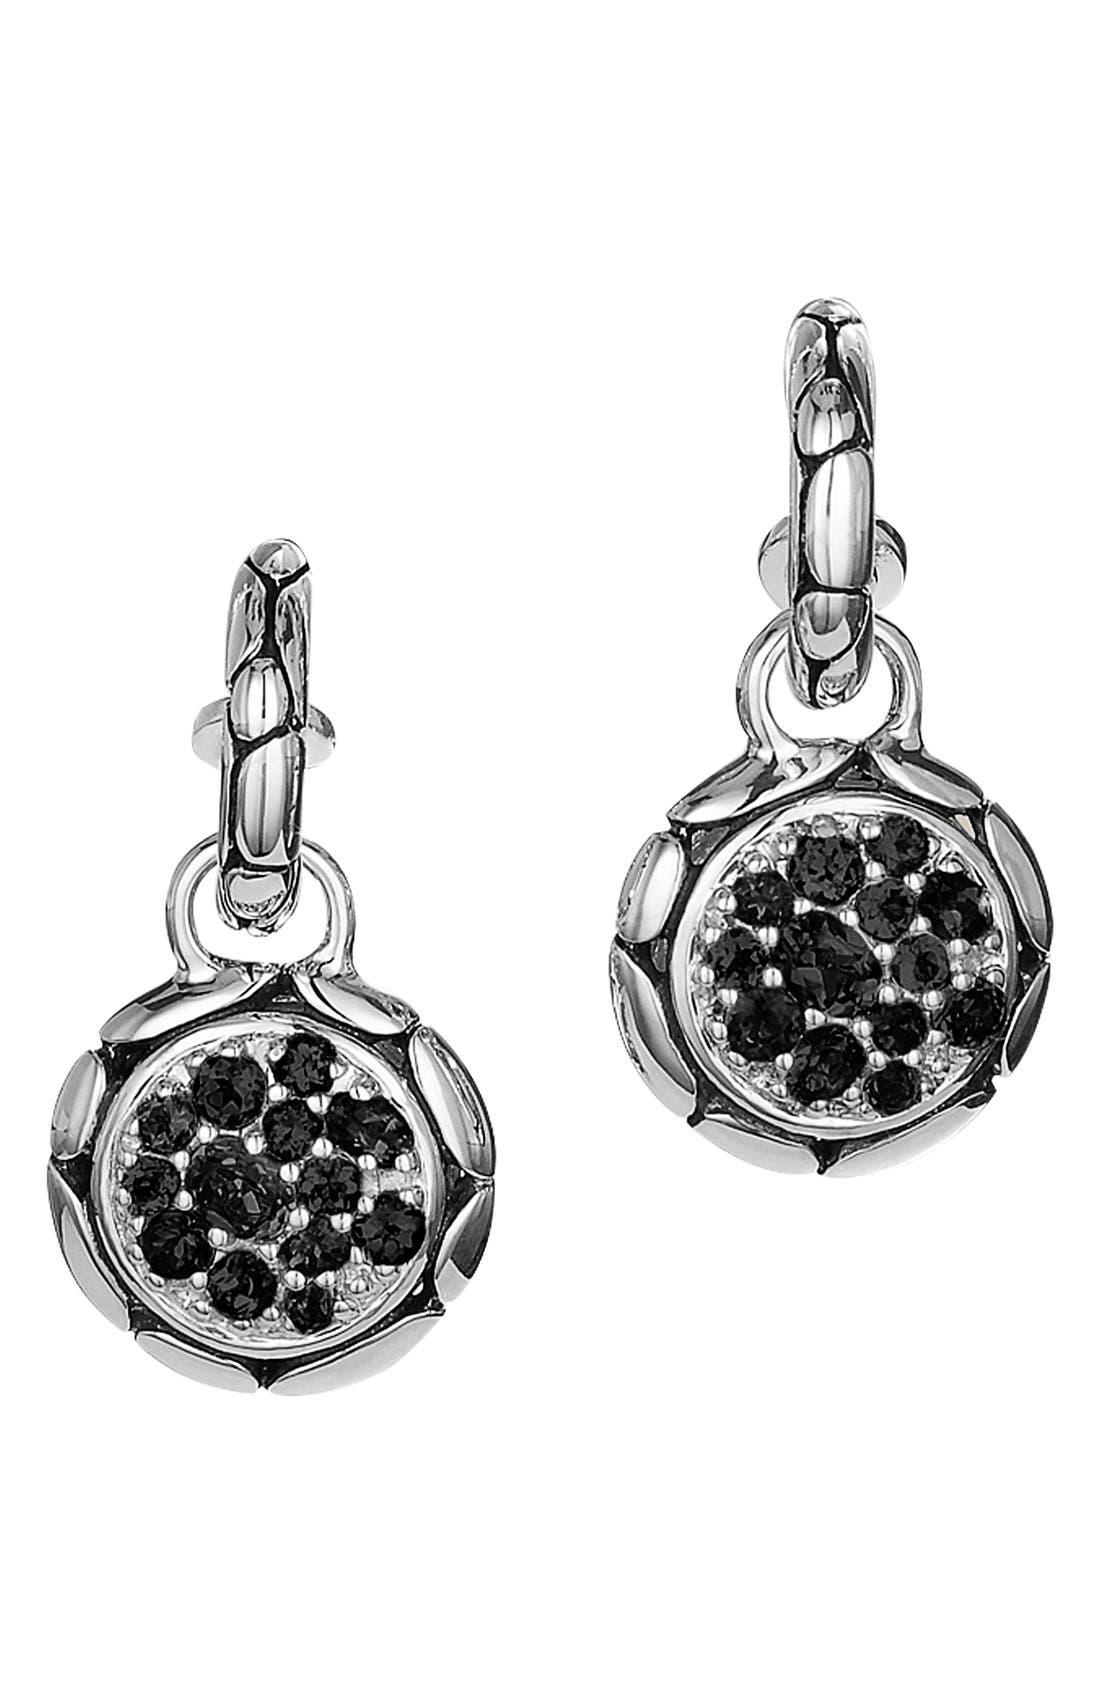 'Kali' Black Sapphire Drop Earrings,                             Main thumbnail 1, color,                             Silver/ Black Sapphire